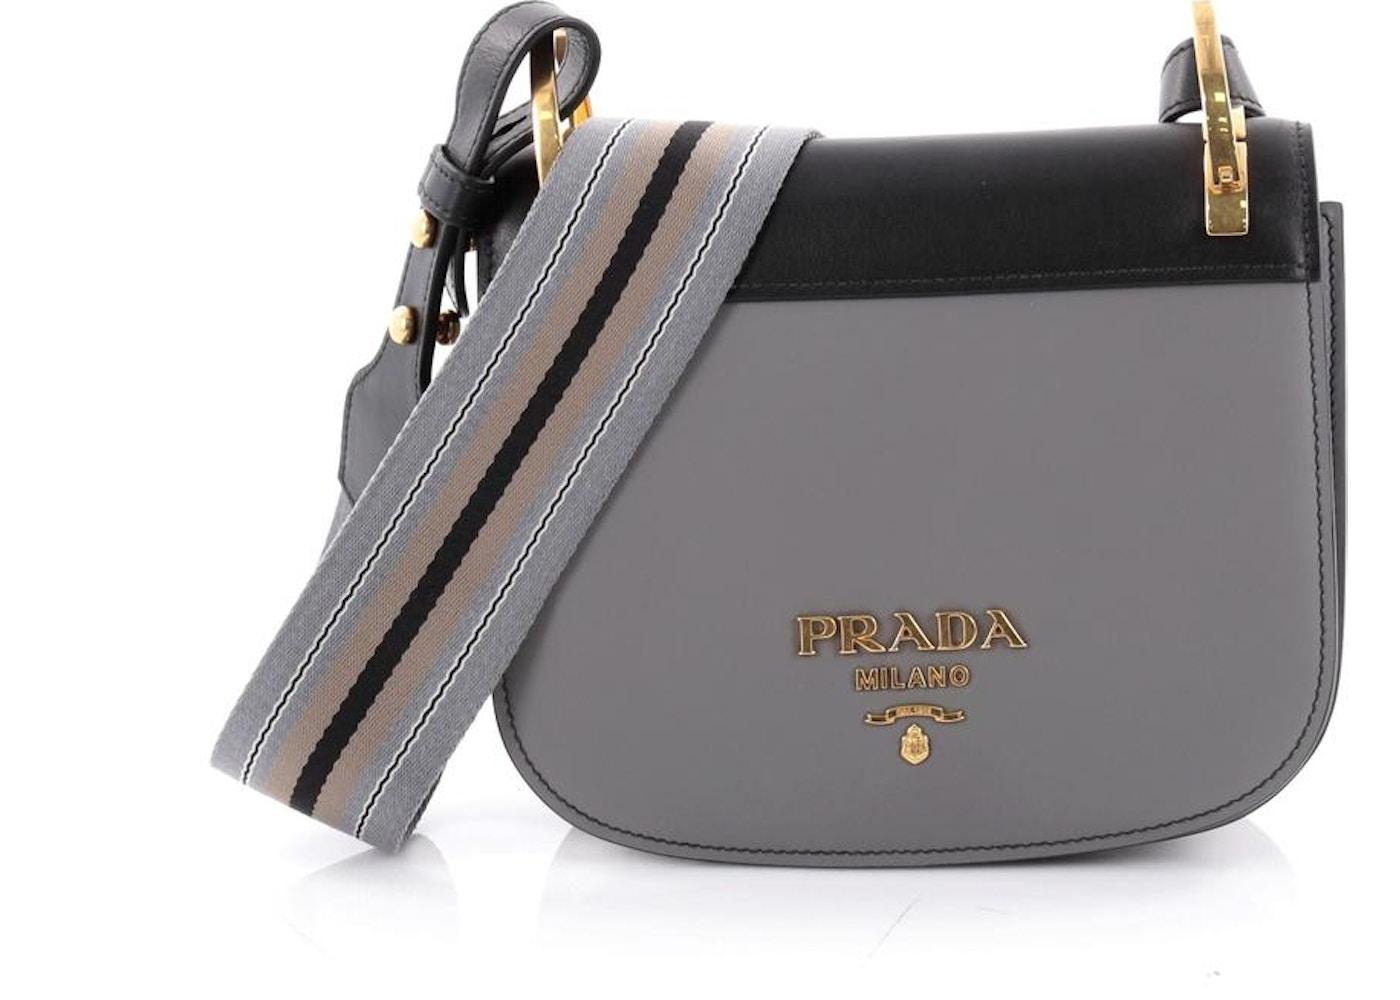 d91be90f36b2 Prada Pionniere Saddle Bag Small Gray/Black. Small Gray/Black